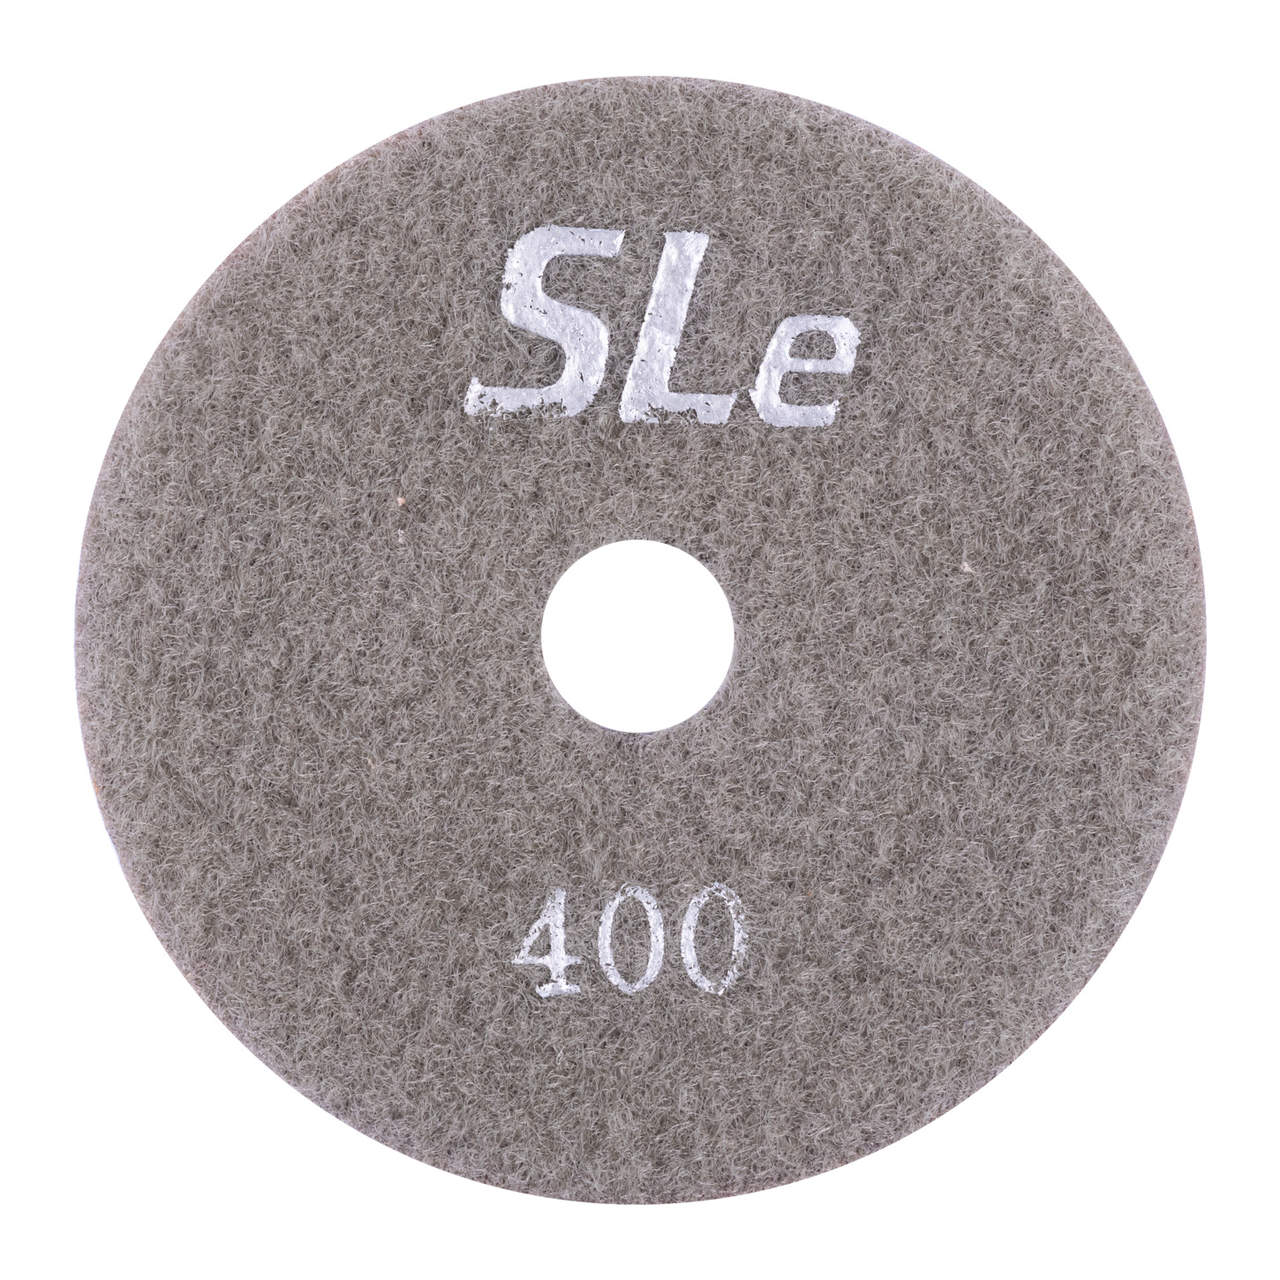 Lixa diamantada SLe colorida 100mm